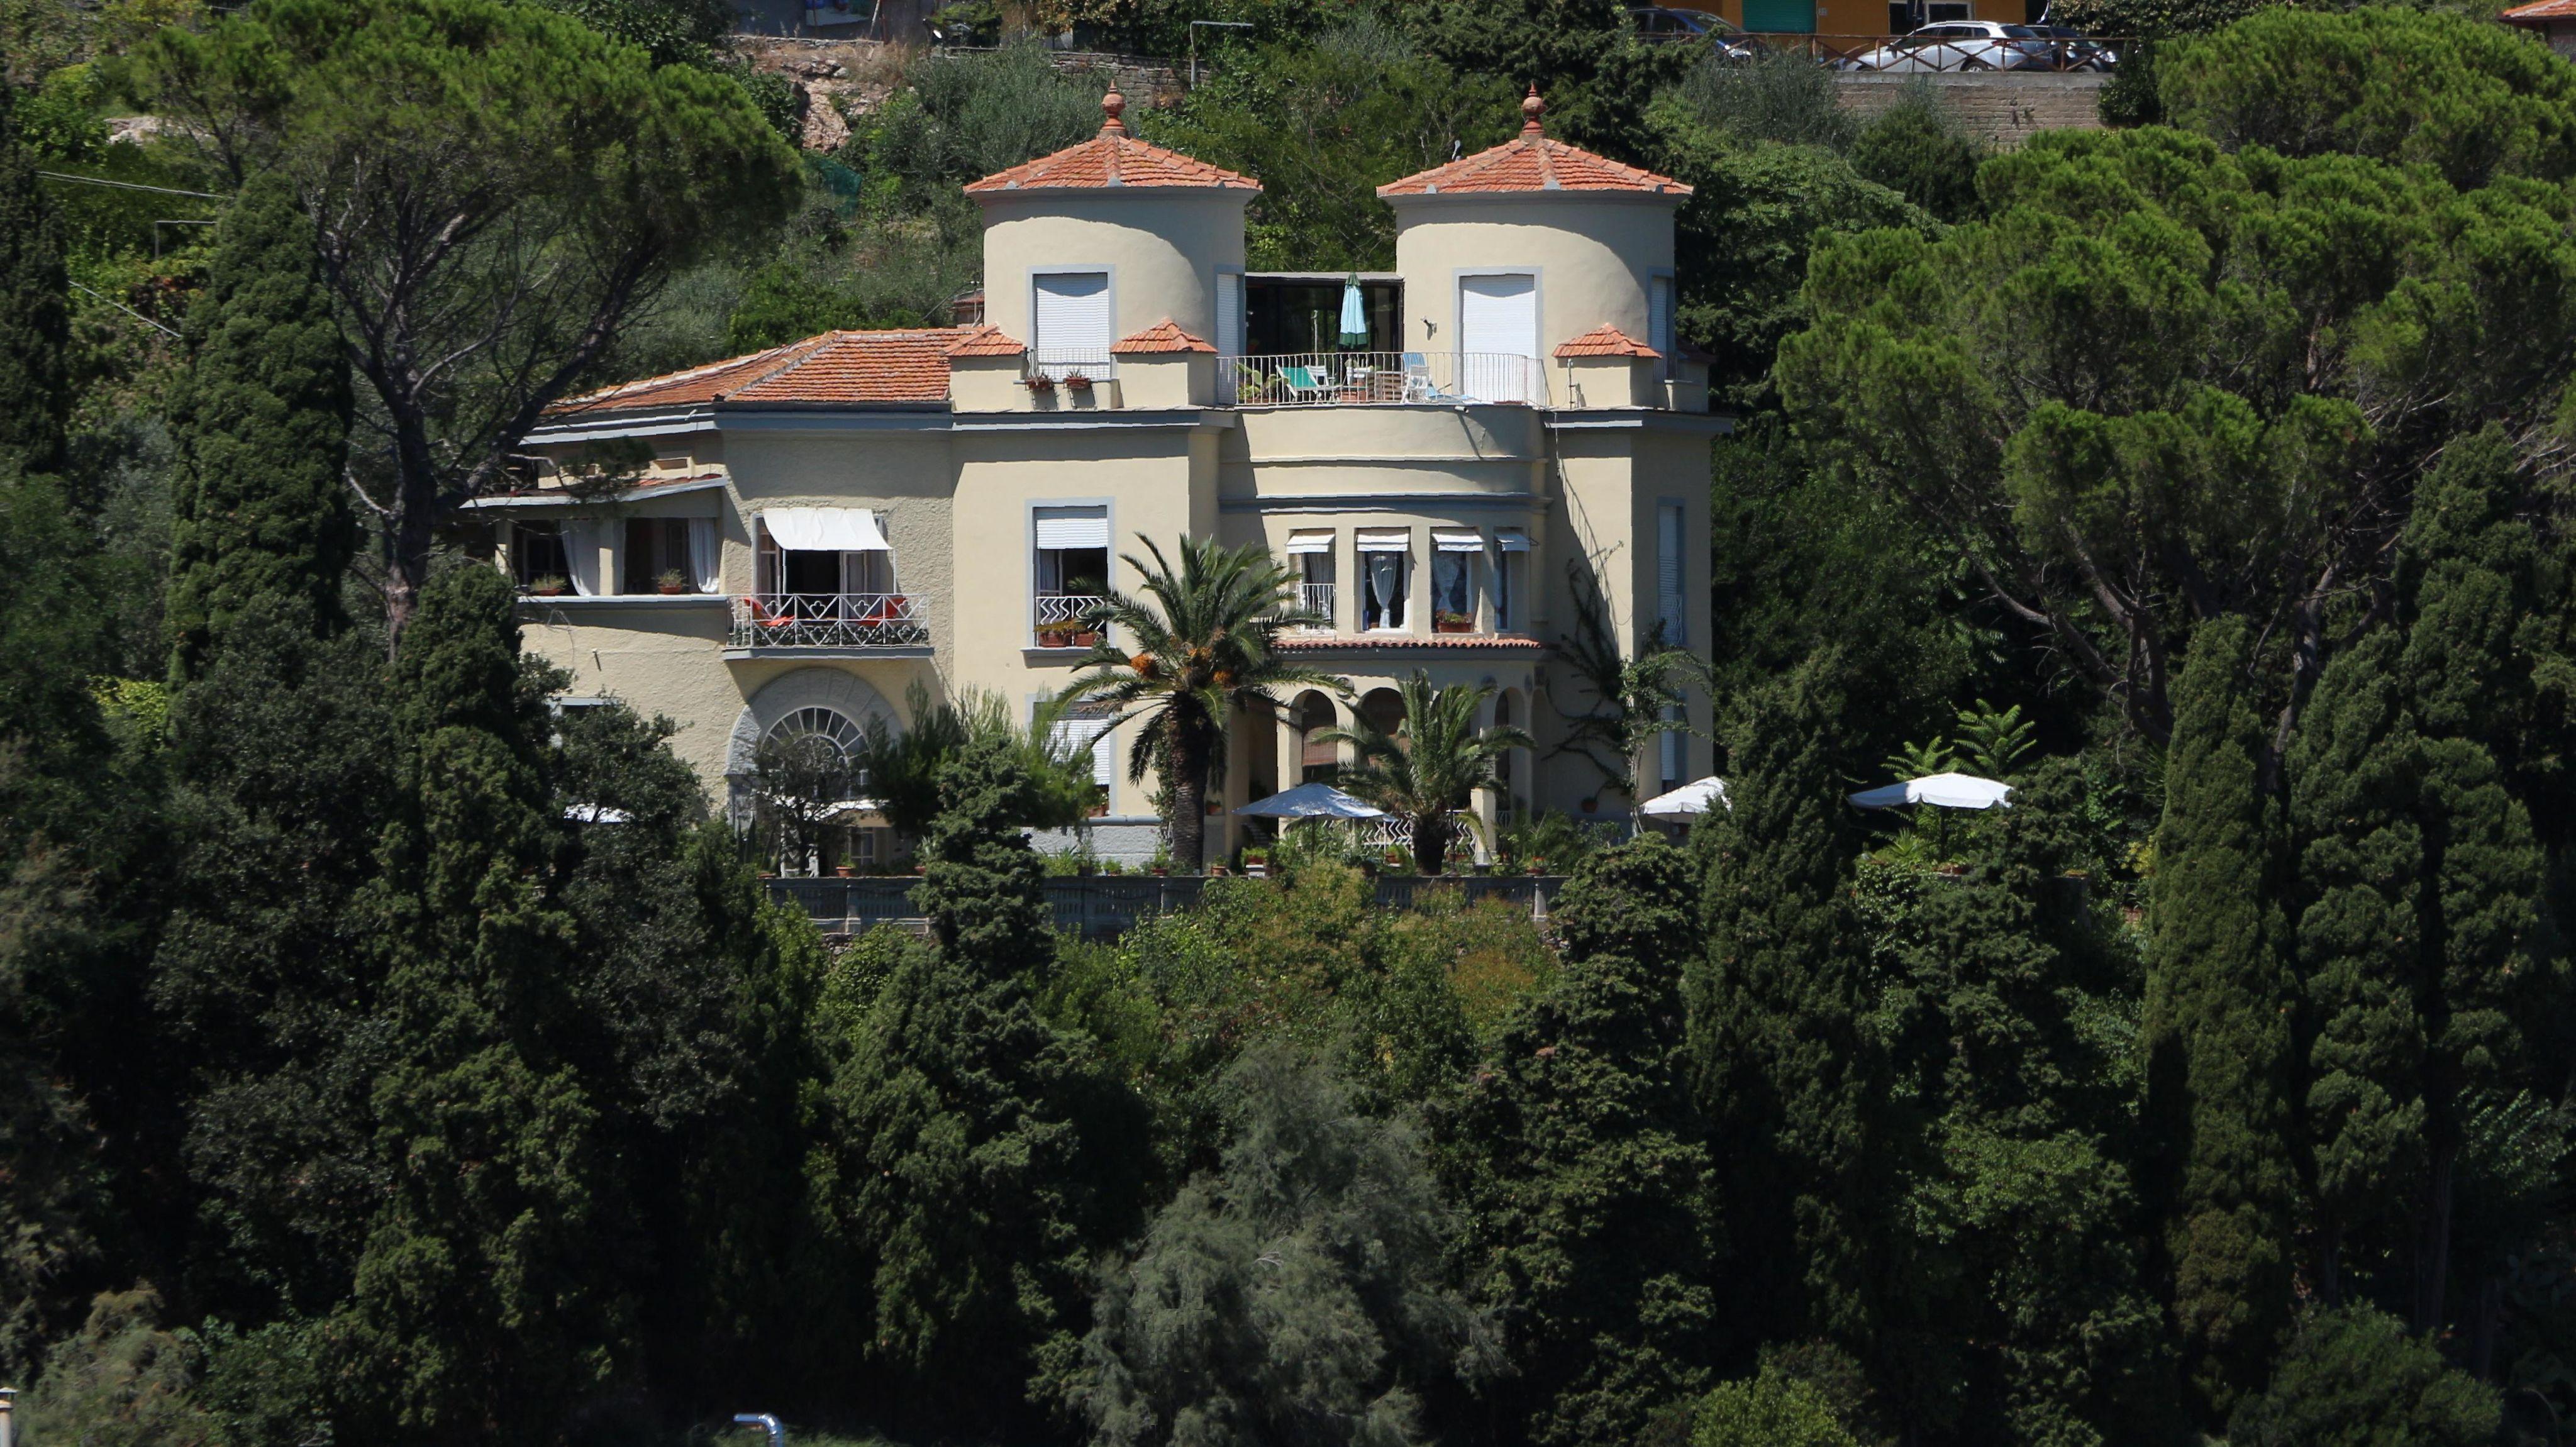 La Giocondiana - Villa Viti